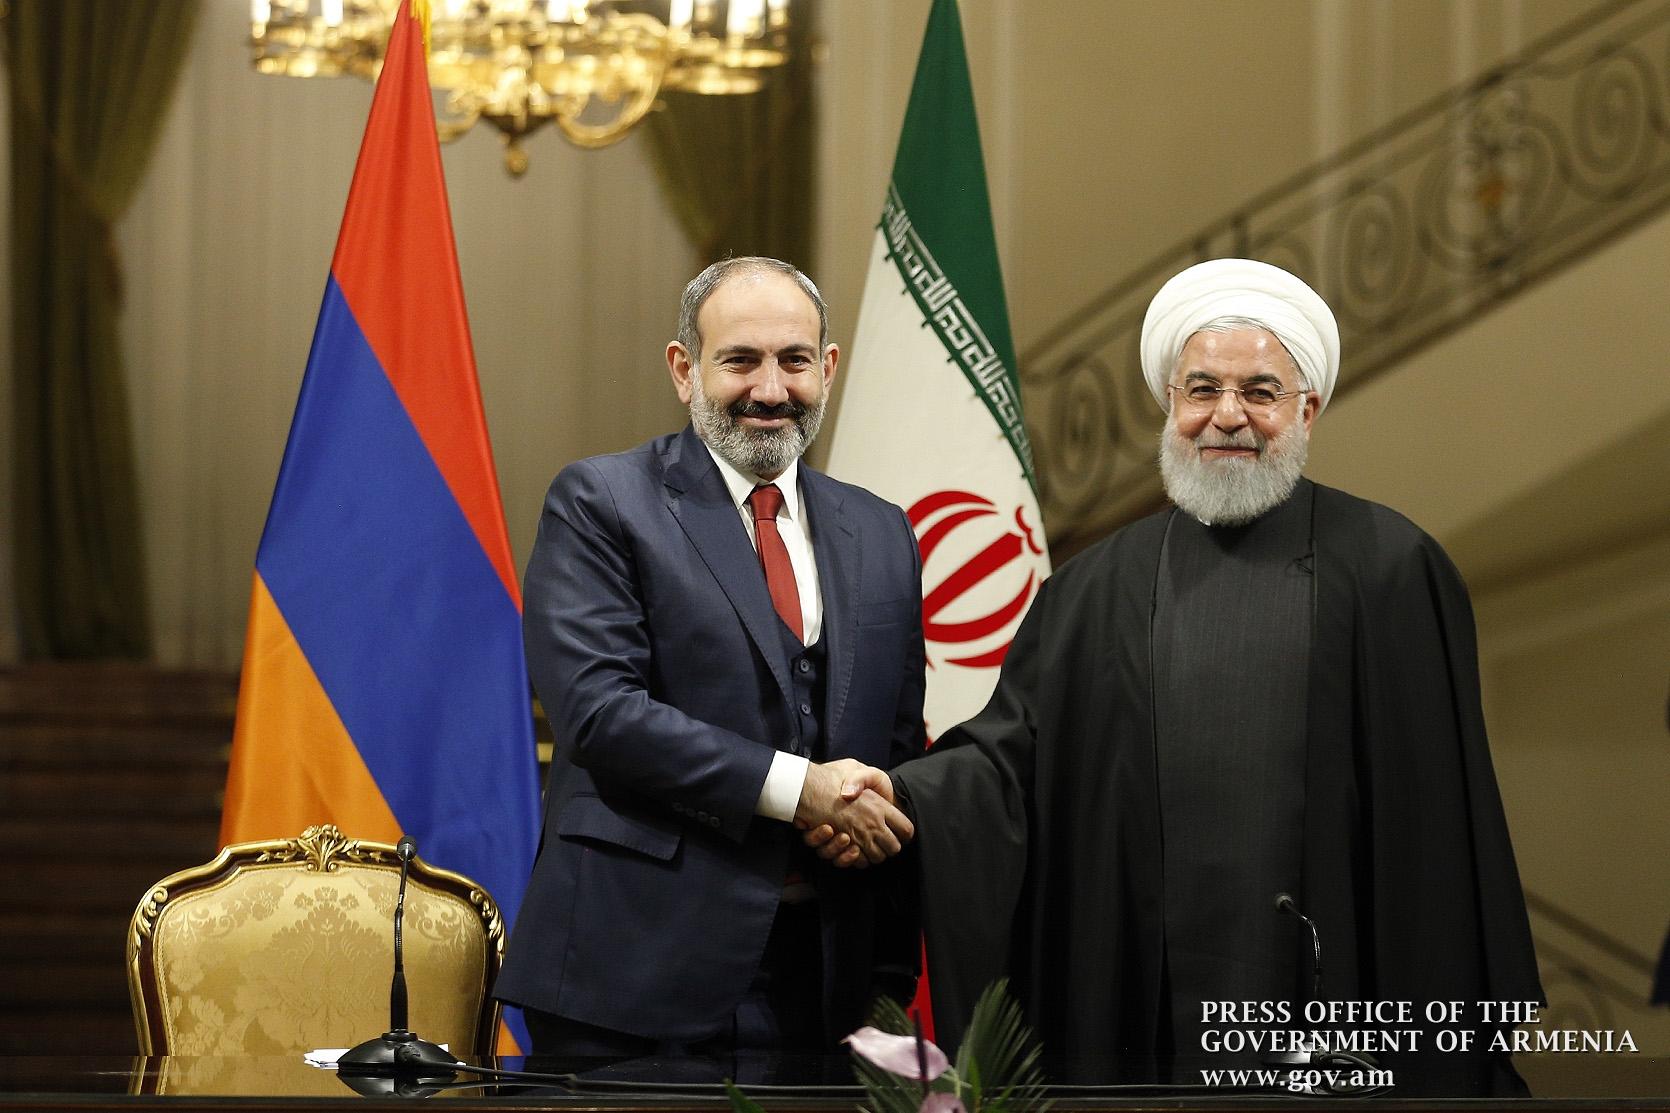 Photo of «В интересах Ирана видеть в регионе сильную Армению и Арцах, и слабый Азербайджан». Ирановед Ааарон Варданян